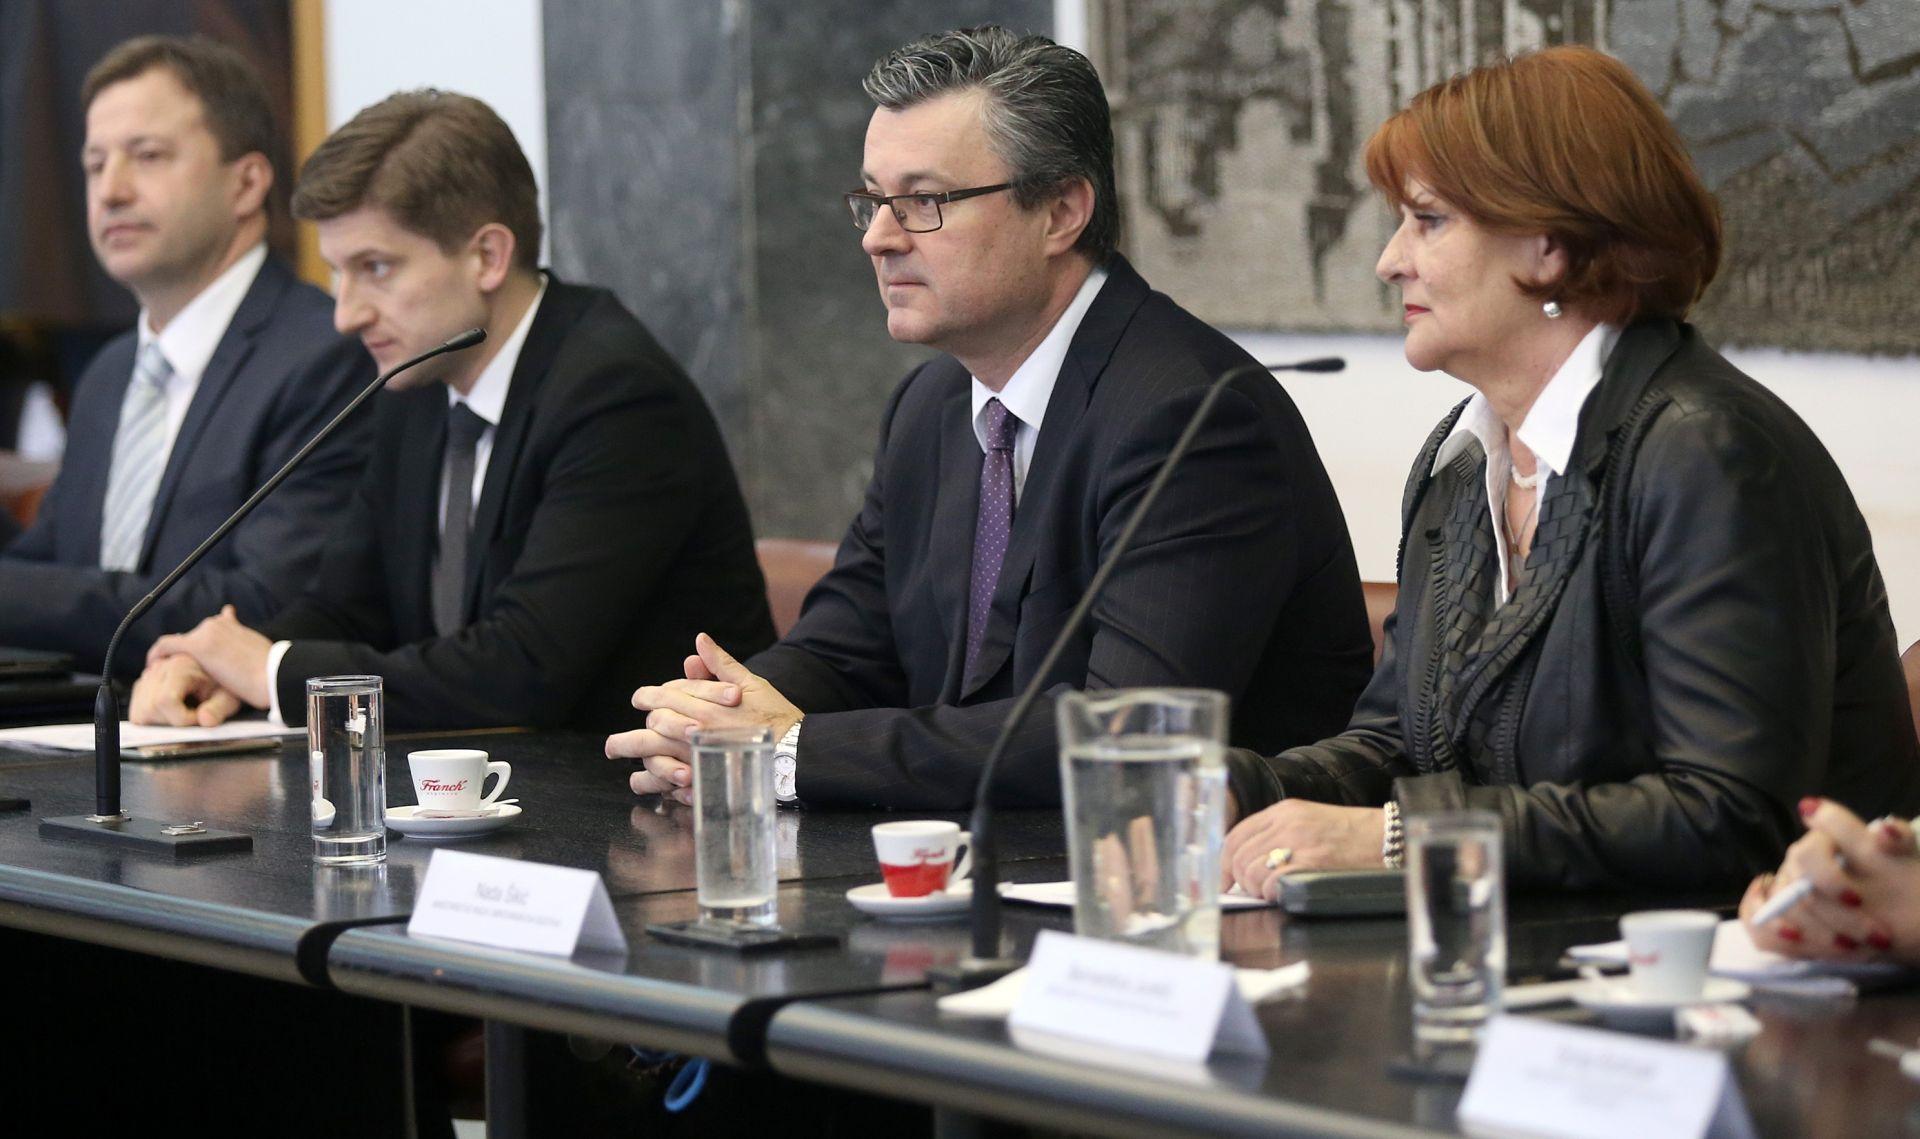 NAKON PREDSTAVLJANJA PRORAČUNA: Agencija Moody's snizila rejting Hrvatske